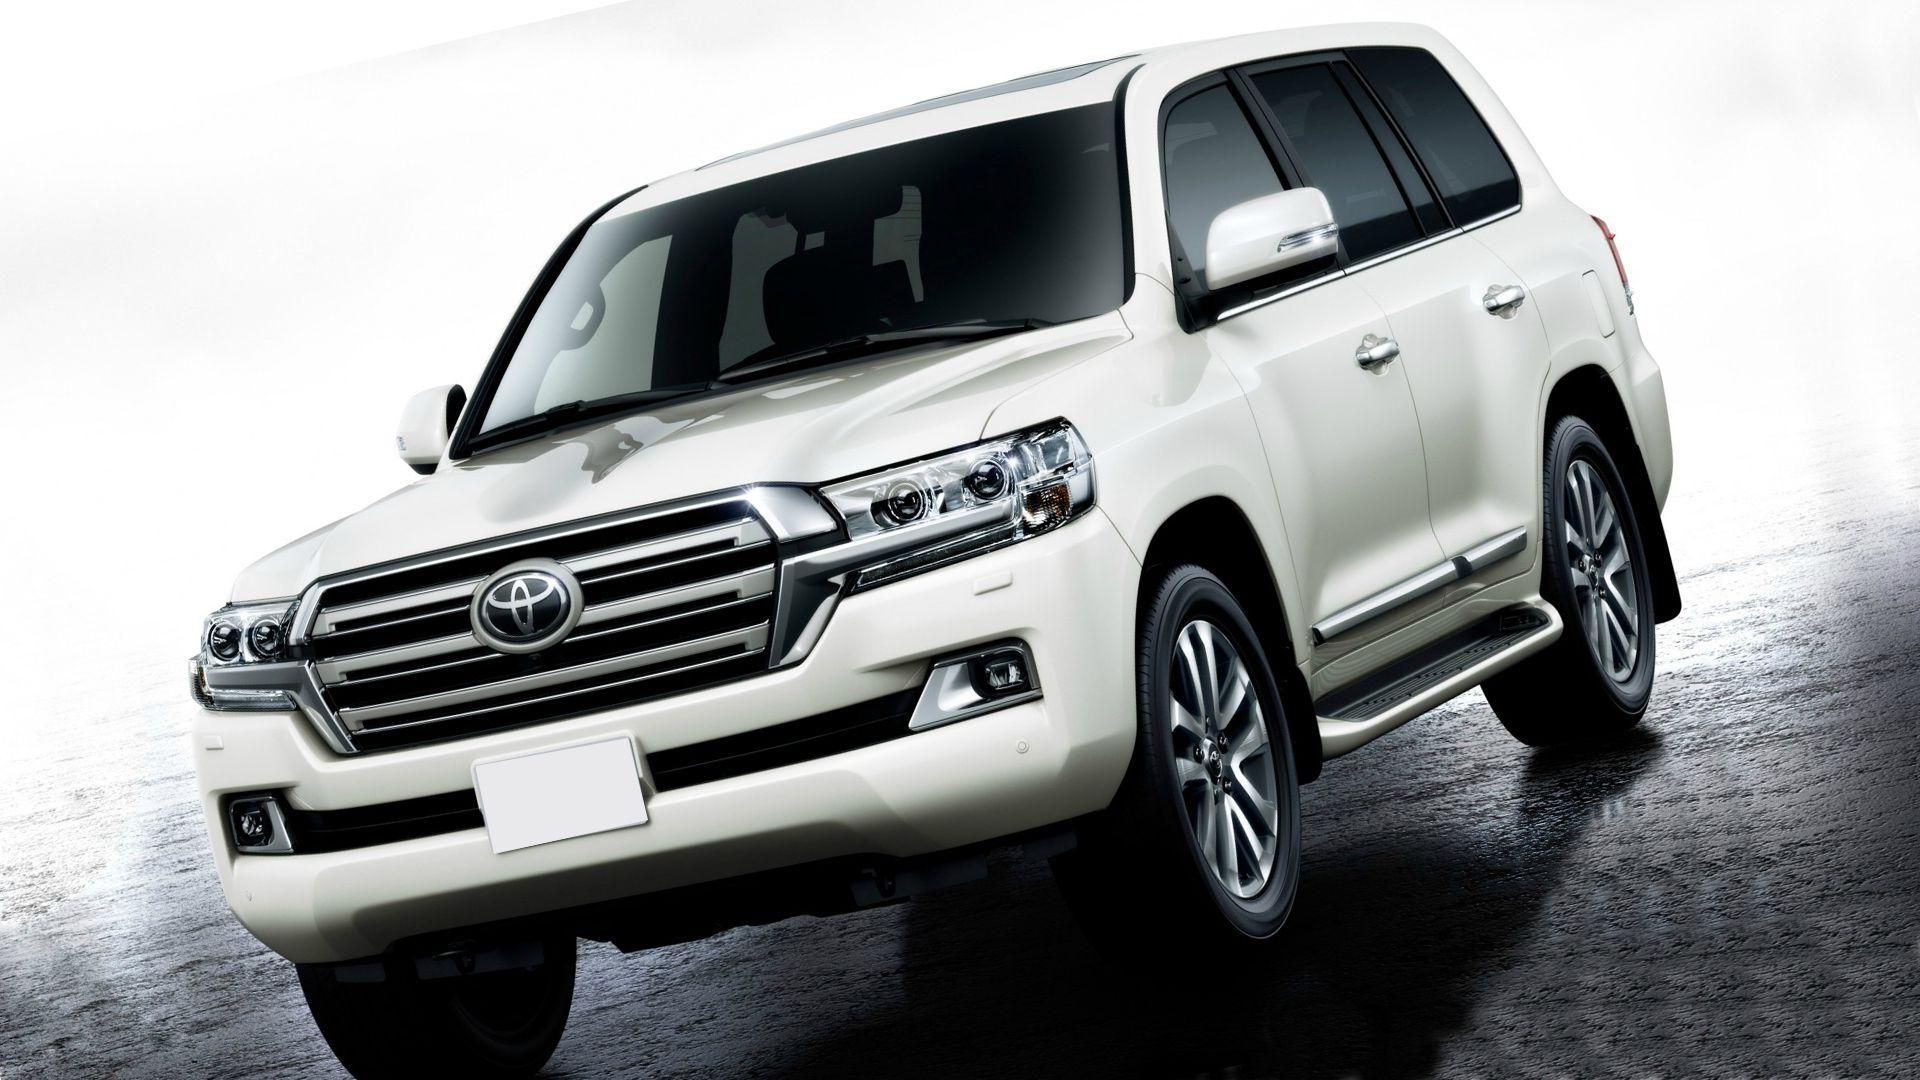 New 2019 Toyota Land Cruiser 200 Price Toyota Land Cruiser Toyota Land Cruiser Diesel Land Cruiser